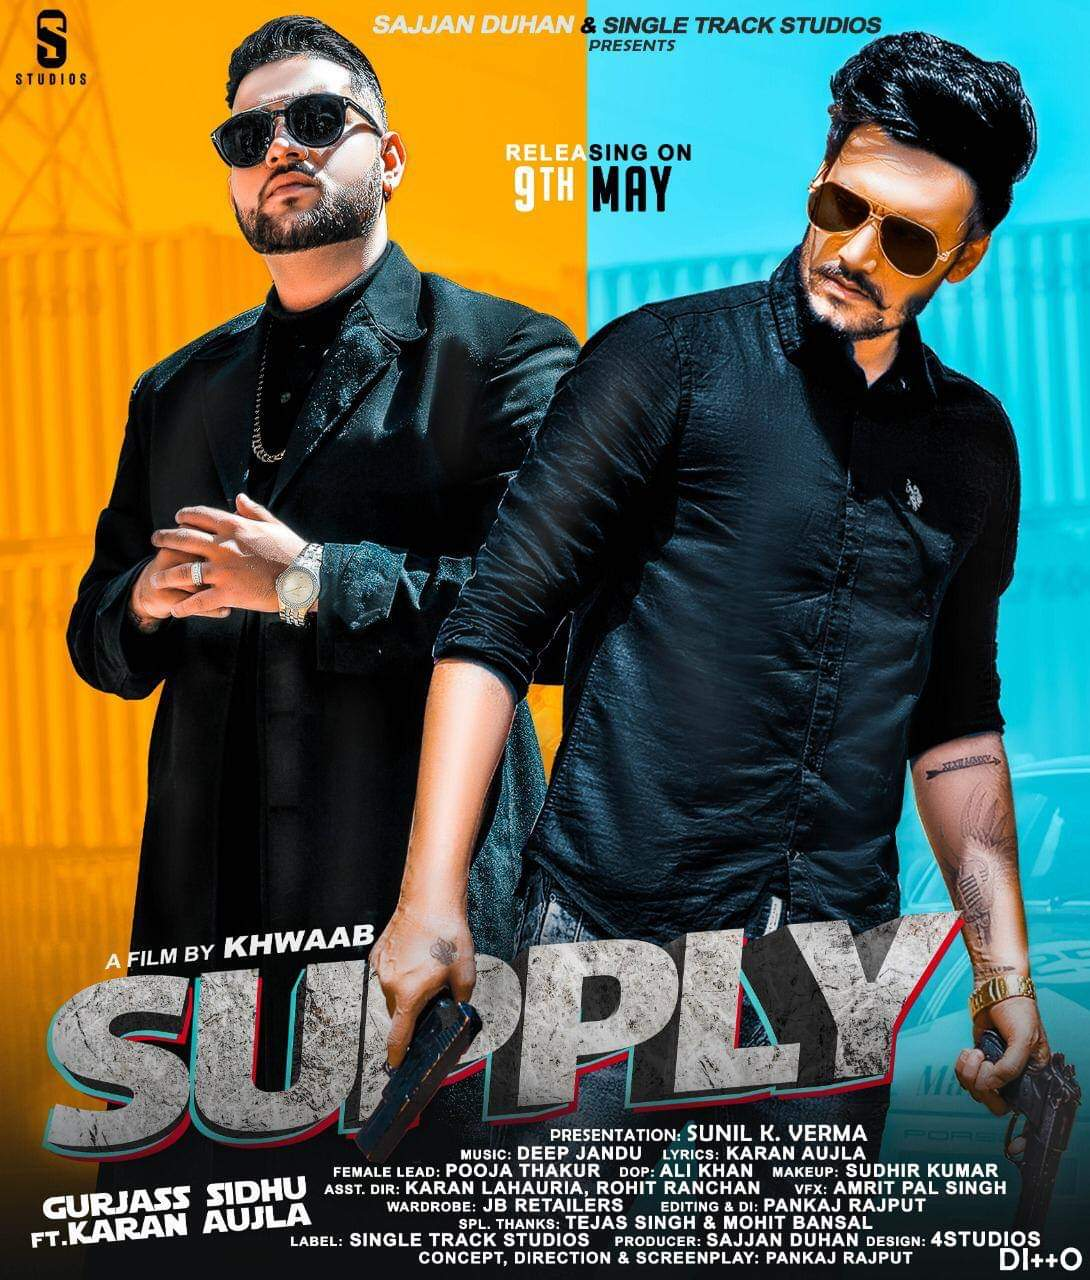 Supply Gurjas Sidhu